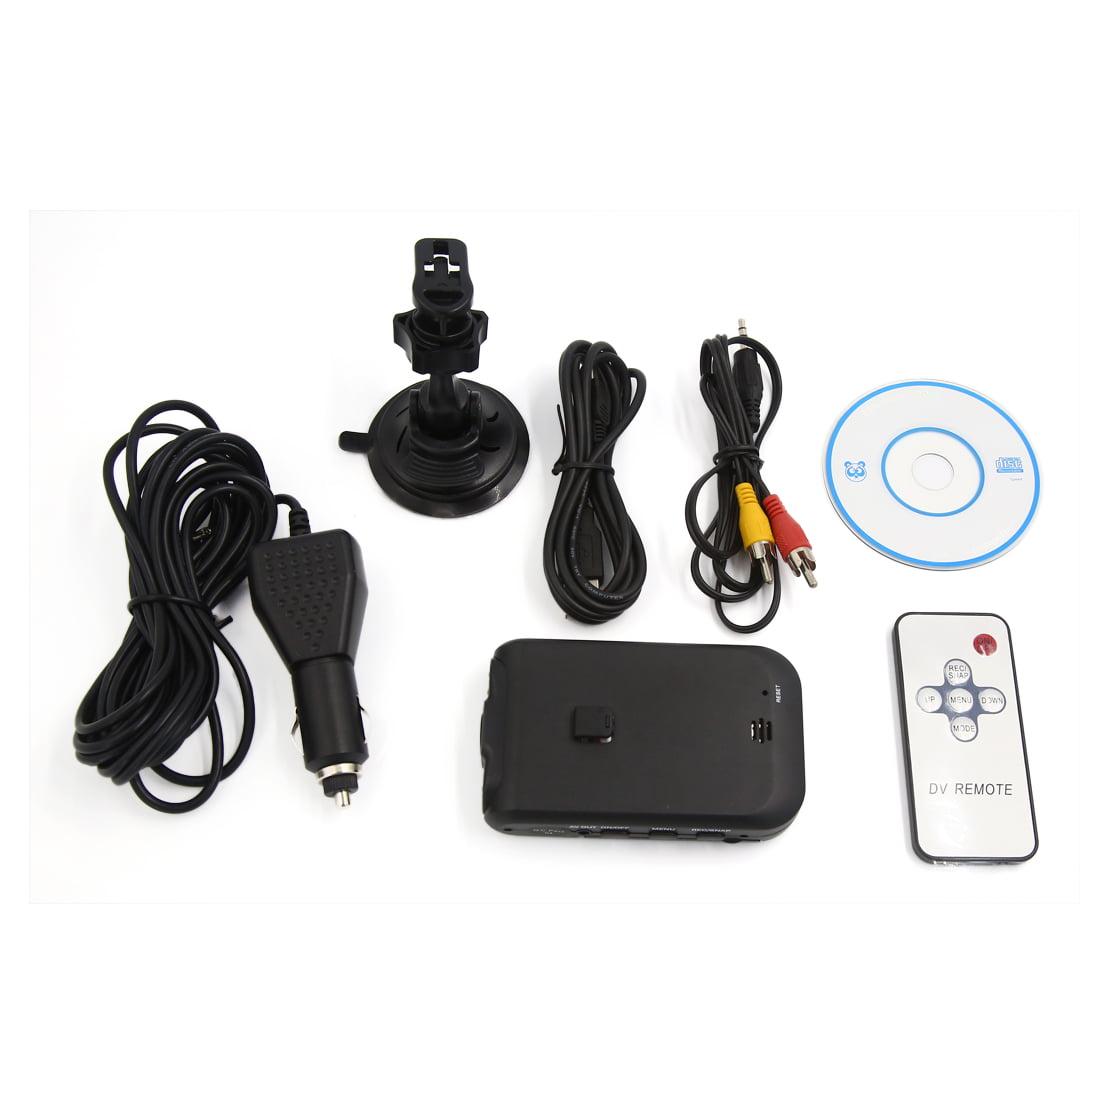 "Portable Black Plastic 2.5"" TFT Screen Auto Car Video Recorder DVR Night Vision - image 3 of 5"